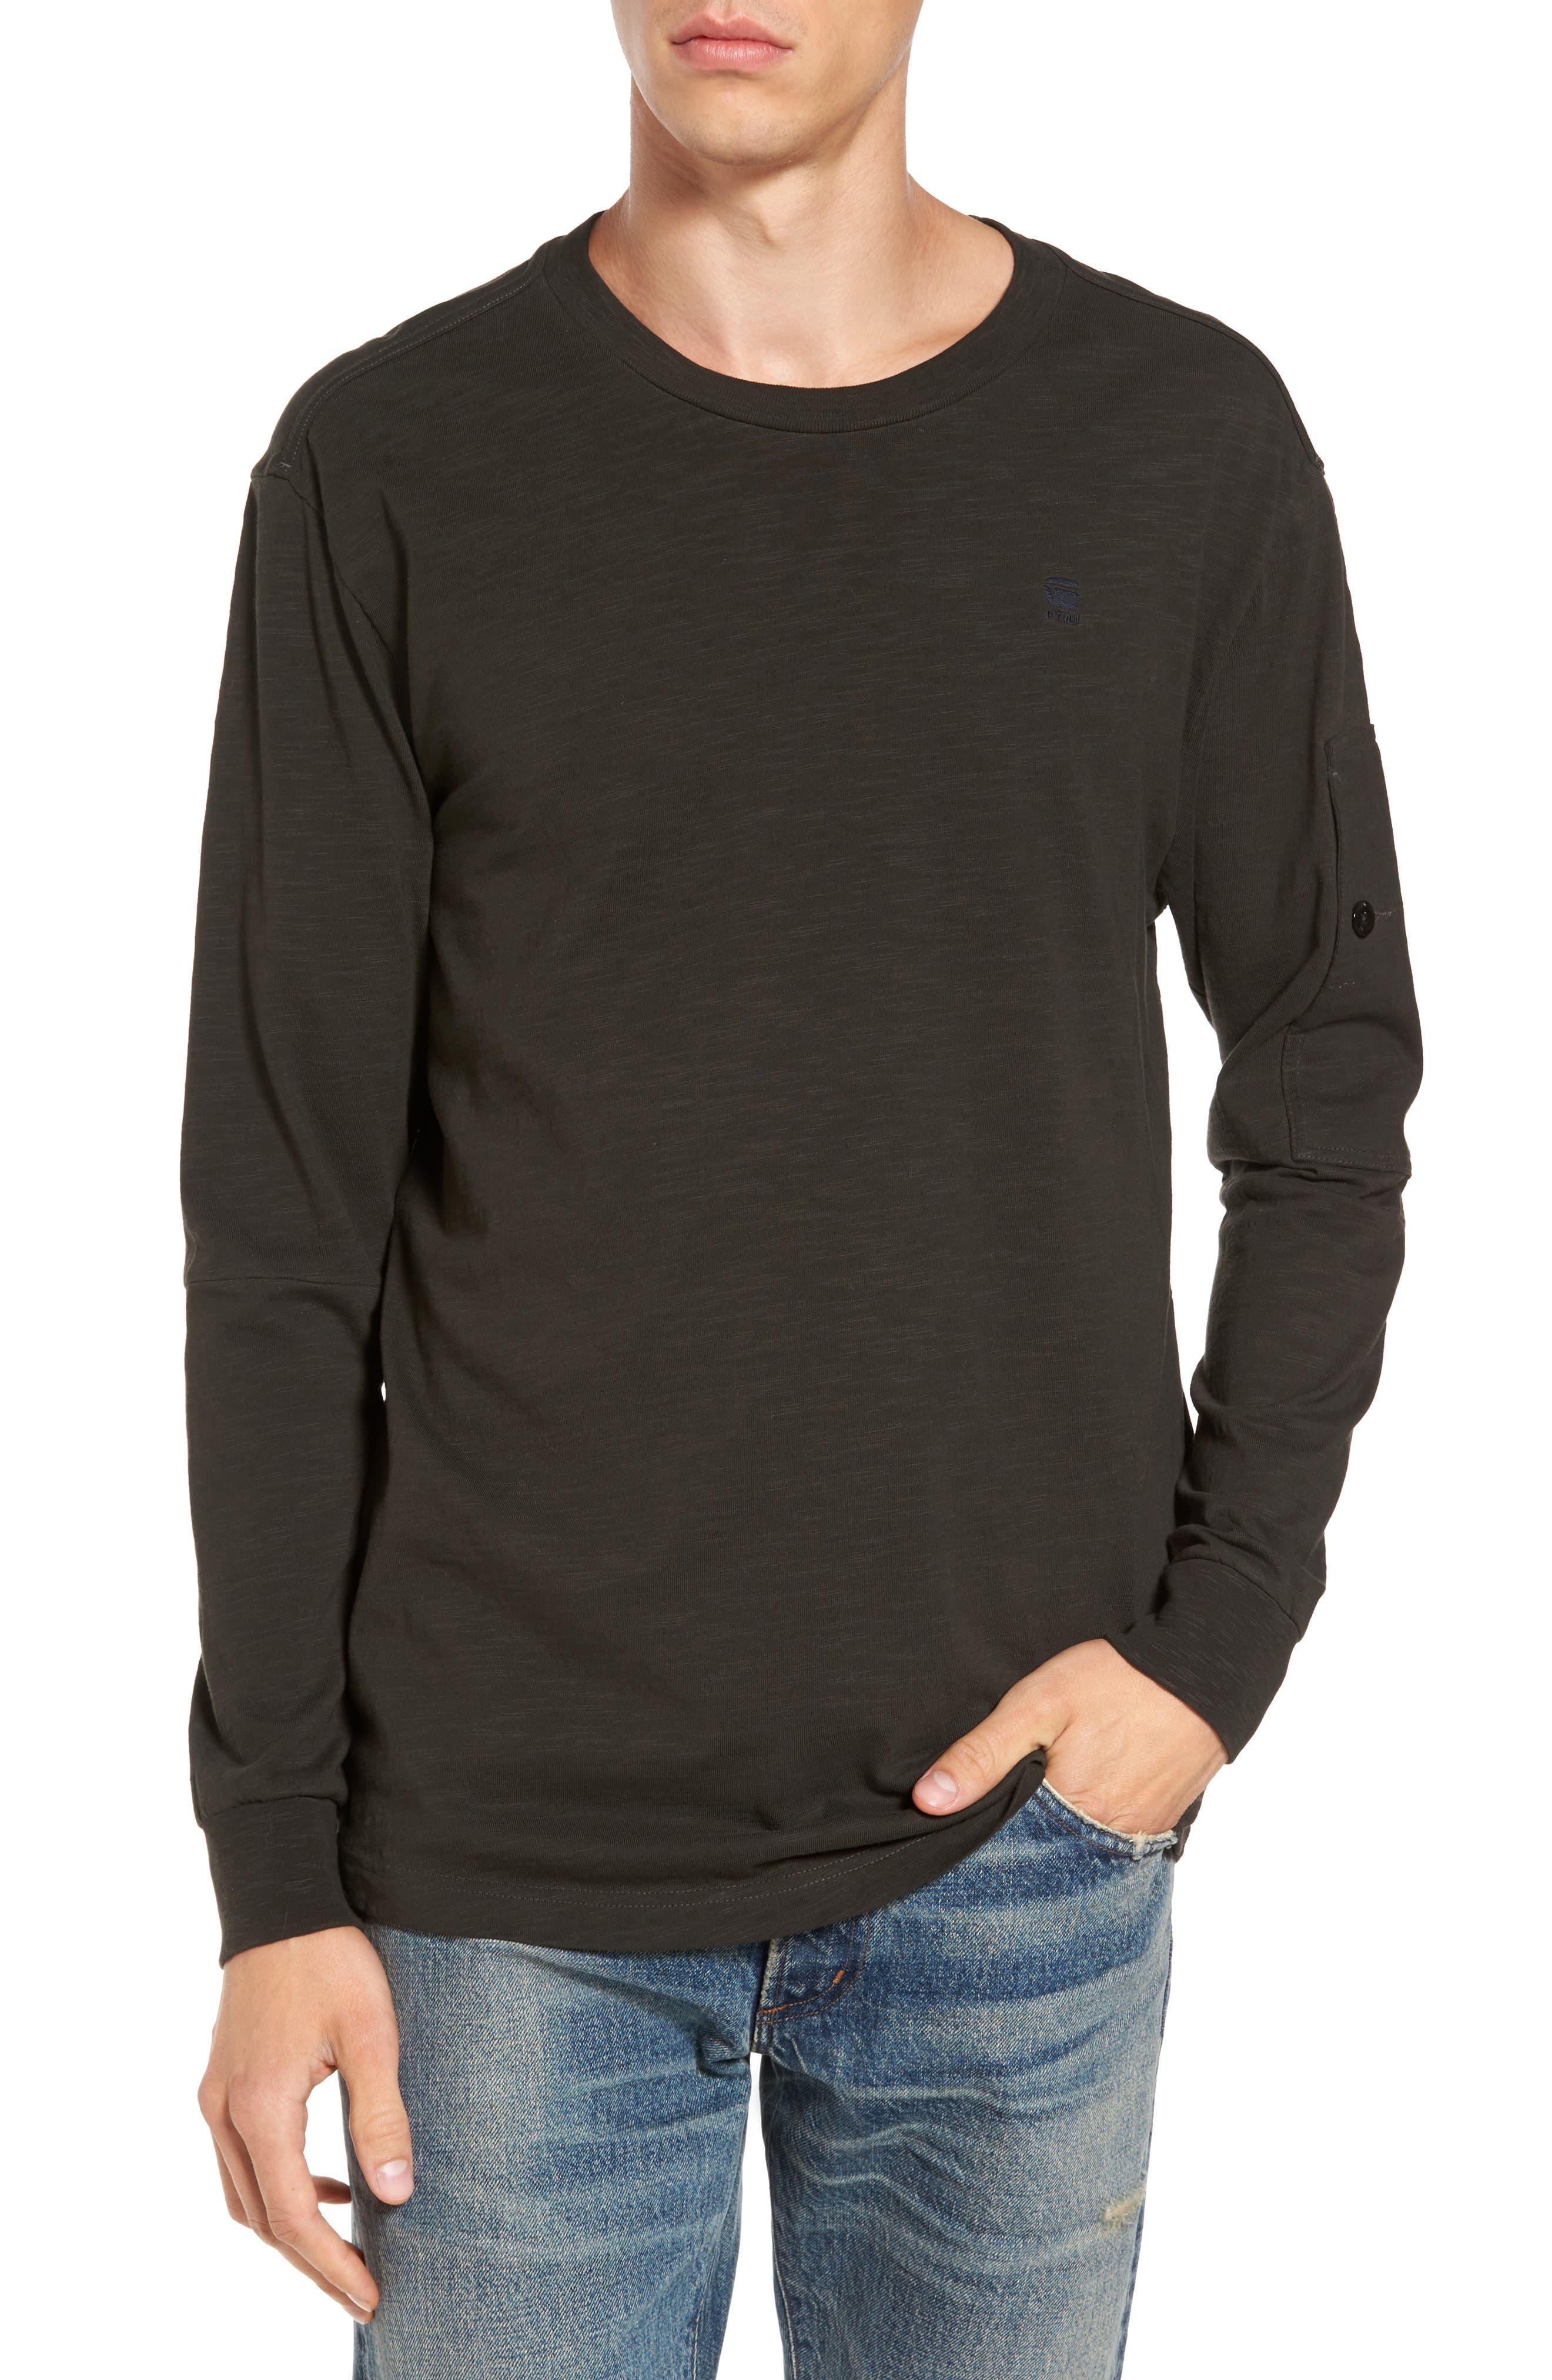 Stalt T-Shirt,                         Main,                         color, Green